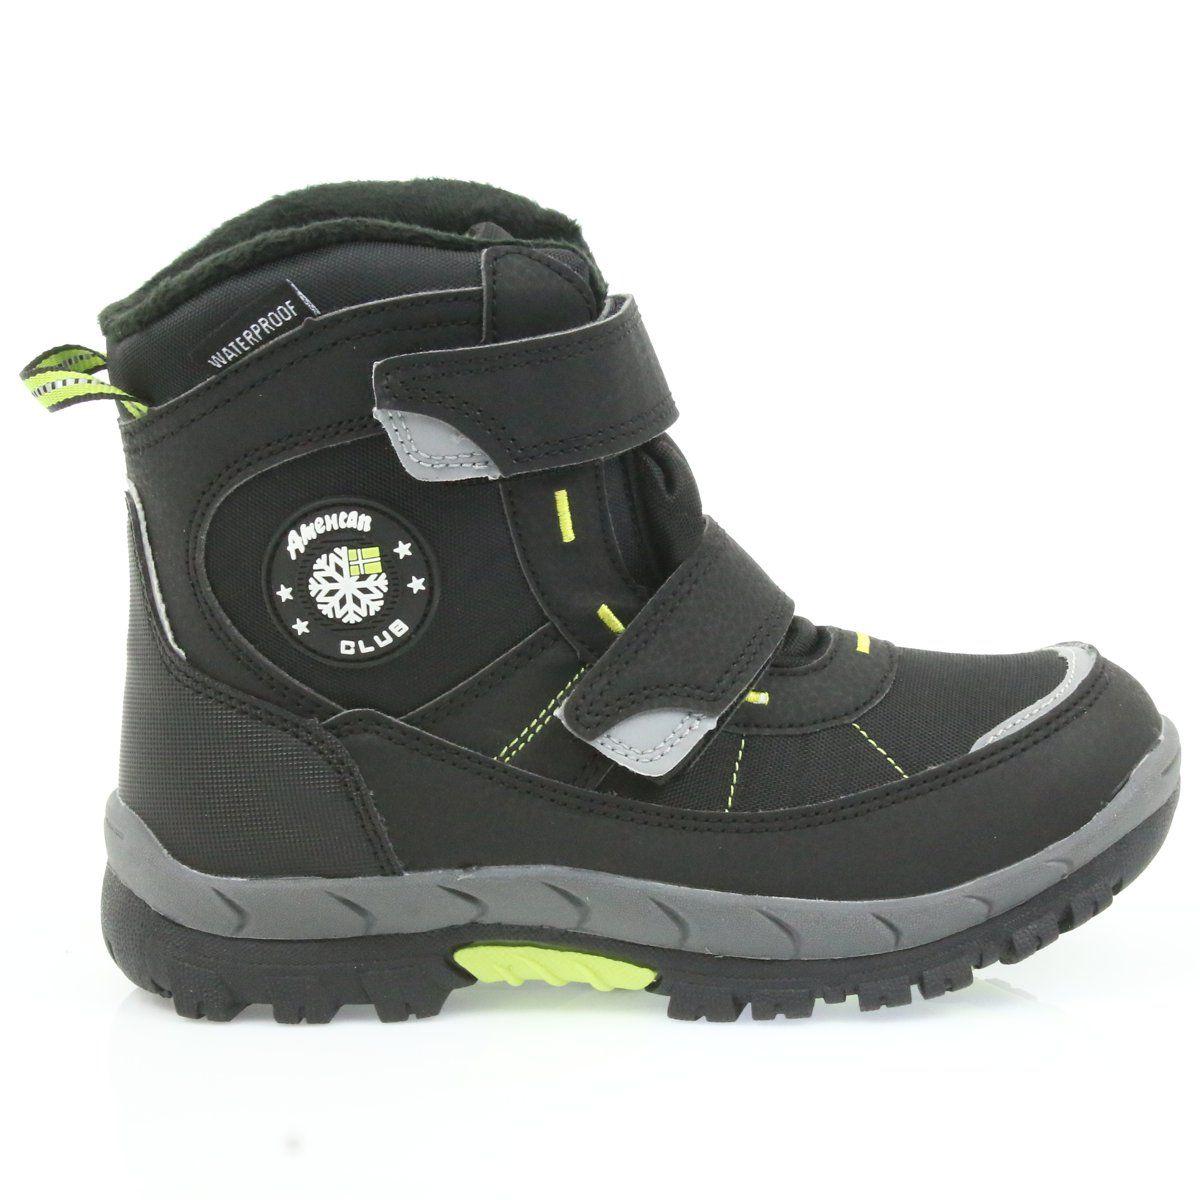 American Club American Kozaki Buty Zimowe Z Membrana 1122 Czarne Zielone Boots Winter Boots Childrens Boots